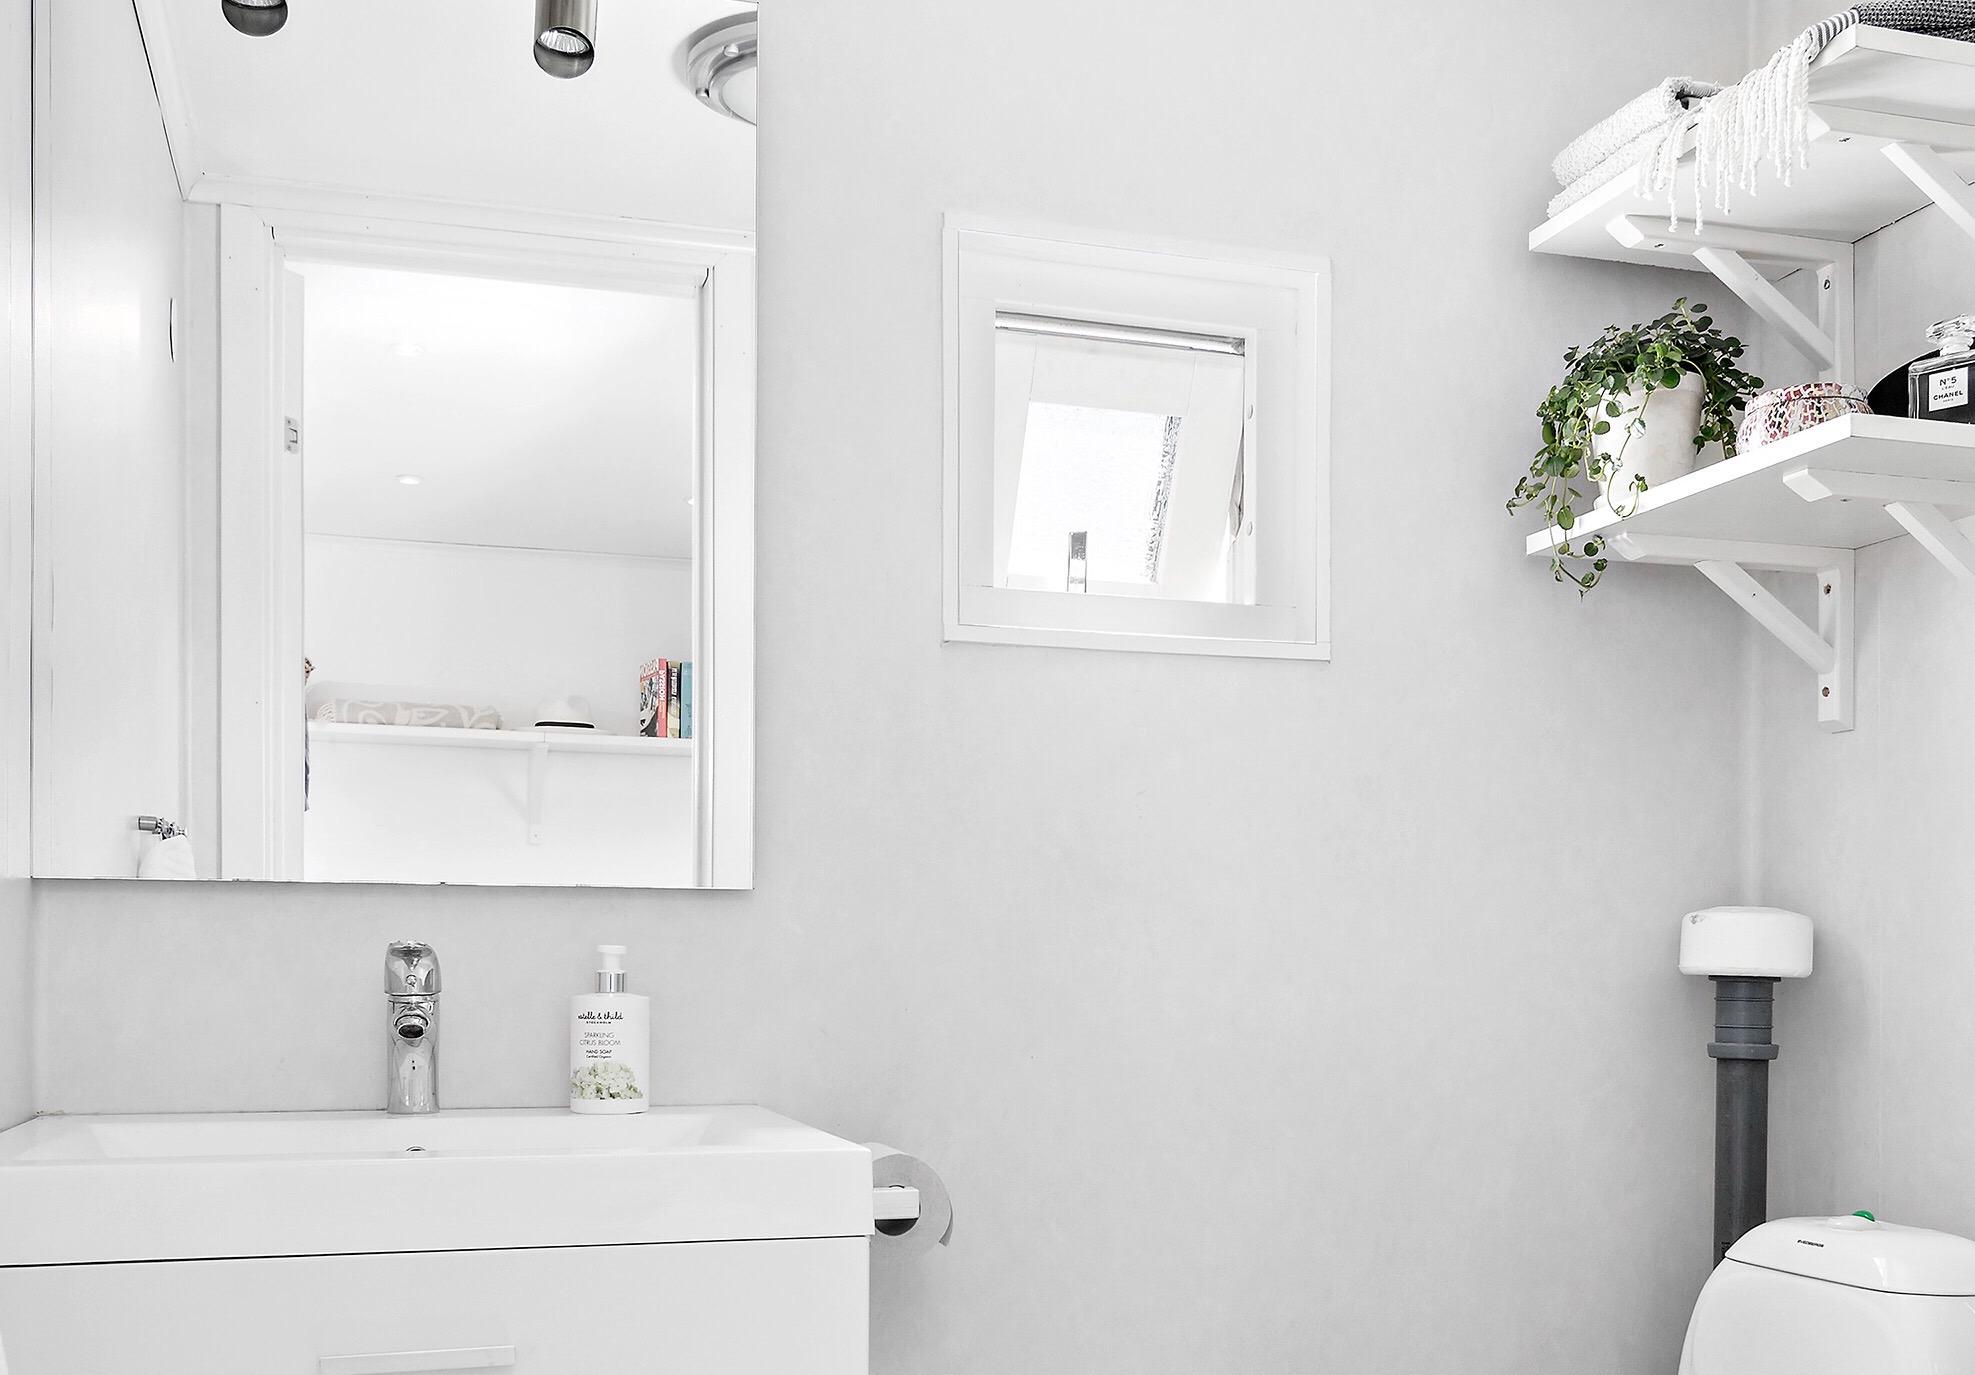 душевая санузел раковина зеркало кран